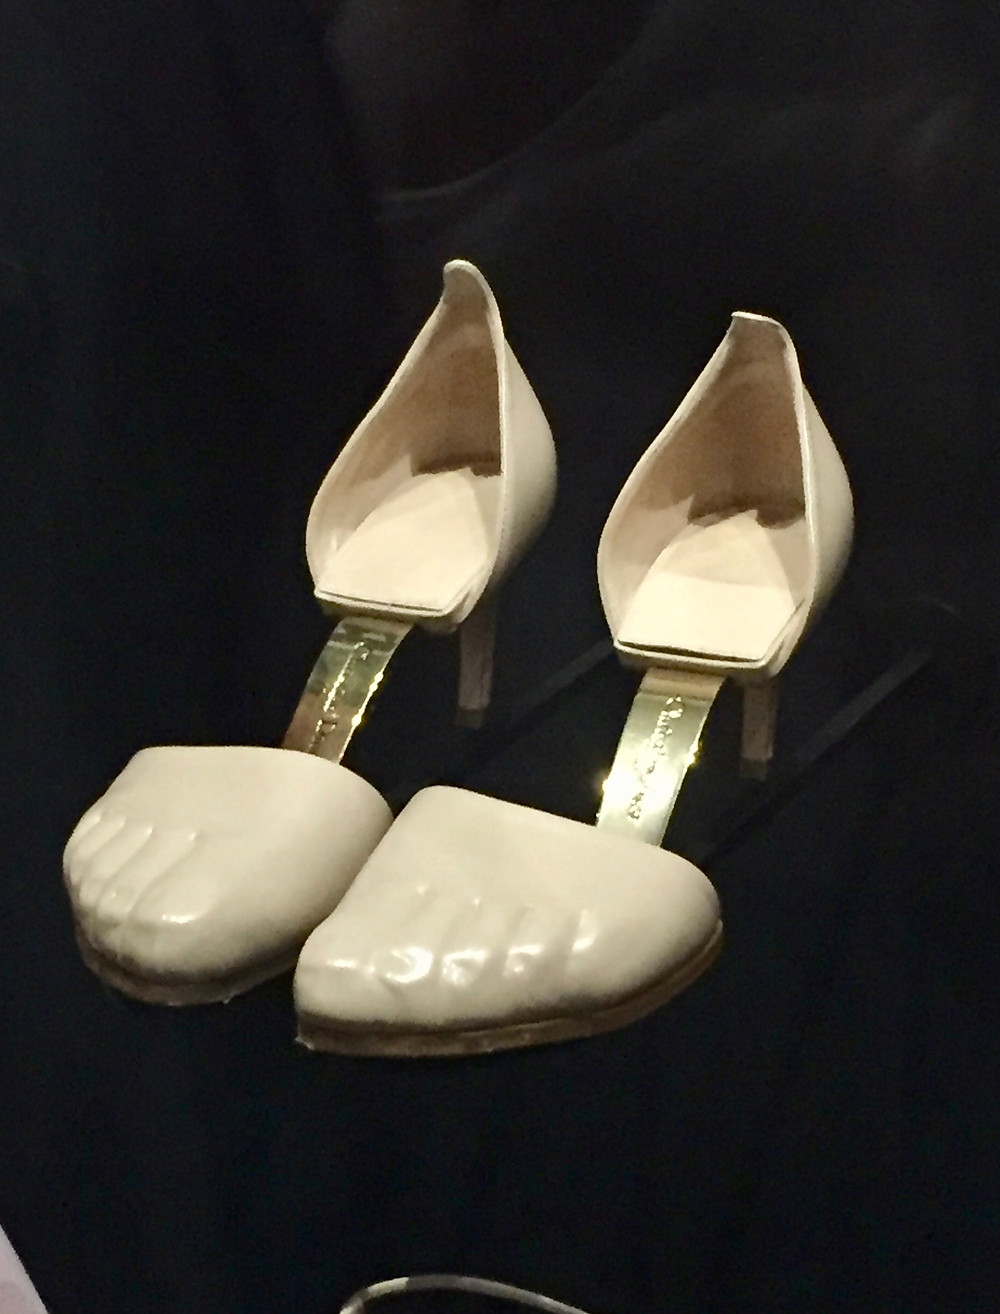 Maria Grazia Chiuri Spring/Summer 2018 Calfskin leather and metal shoes.